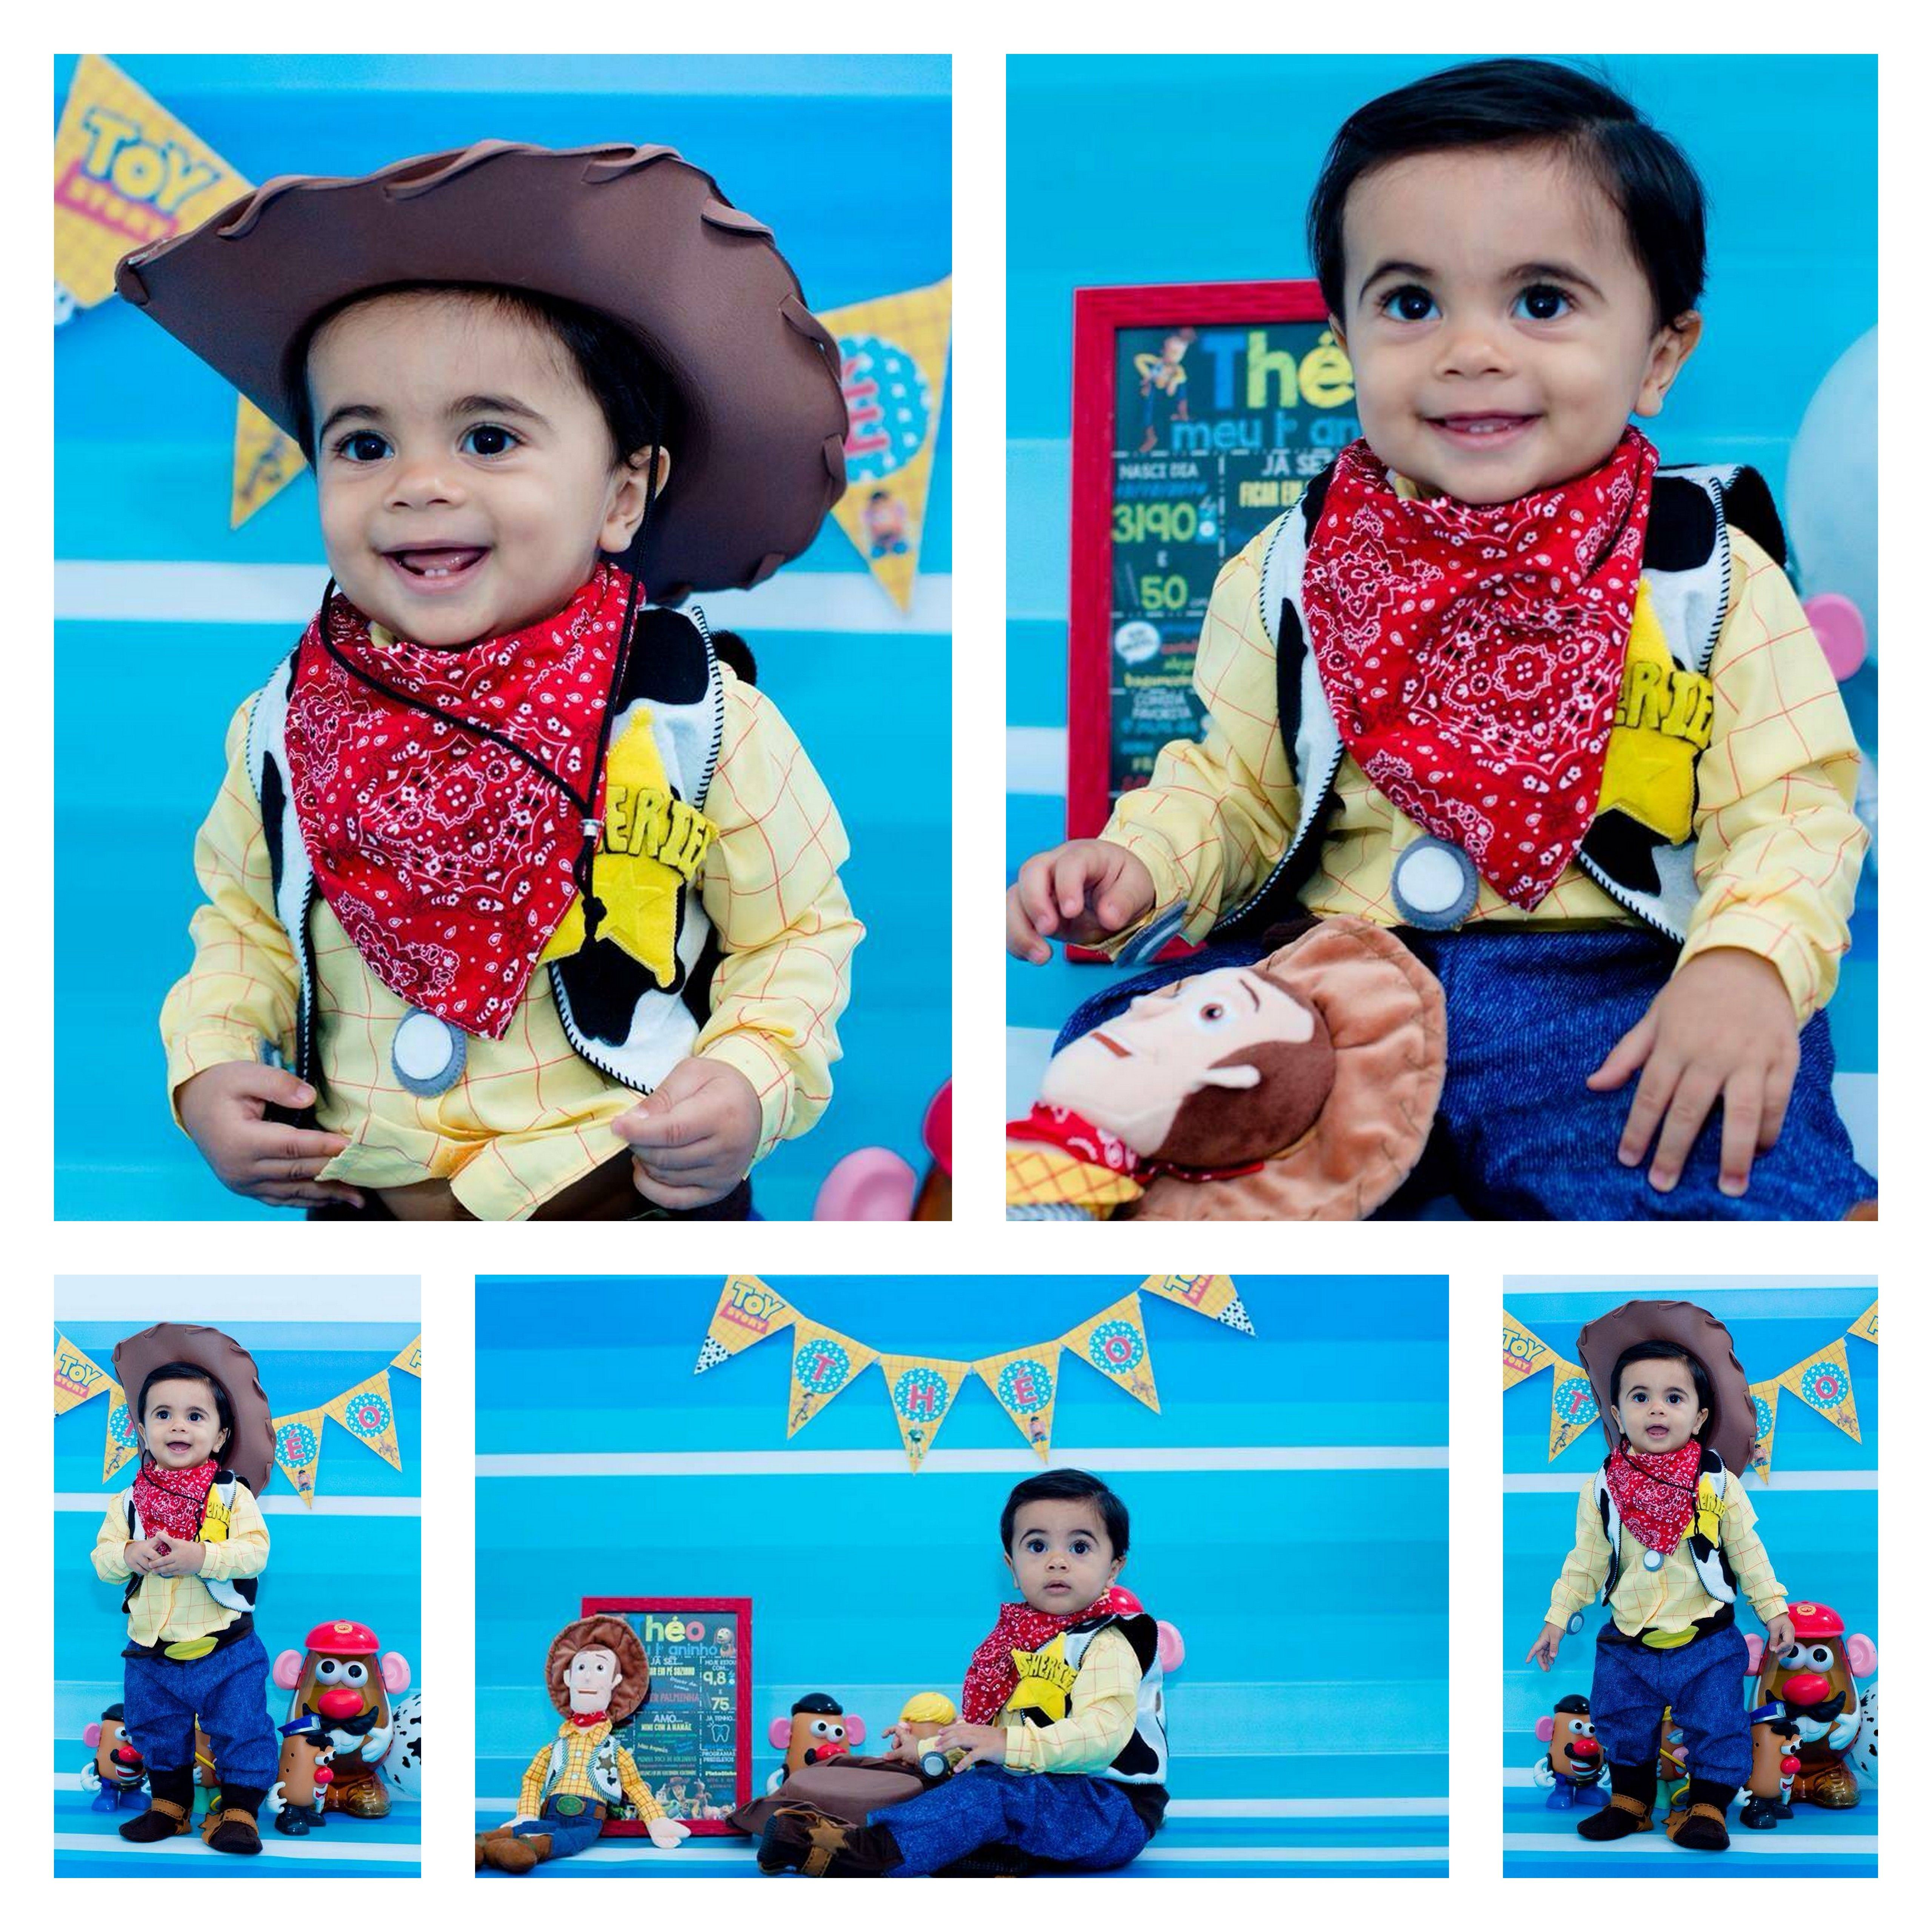 M 225 s de 1000 ideas sobre decoraciones de fiesta de safari en pinterest - Fantasia Woody Tema Toy Story